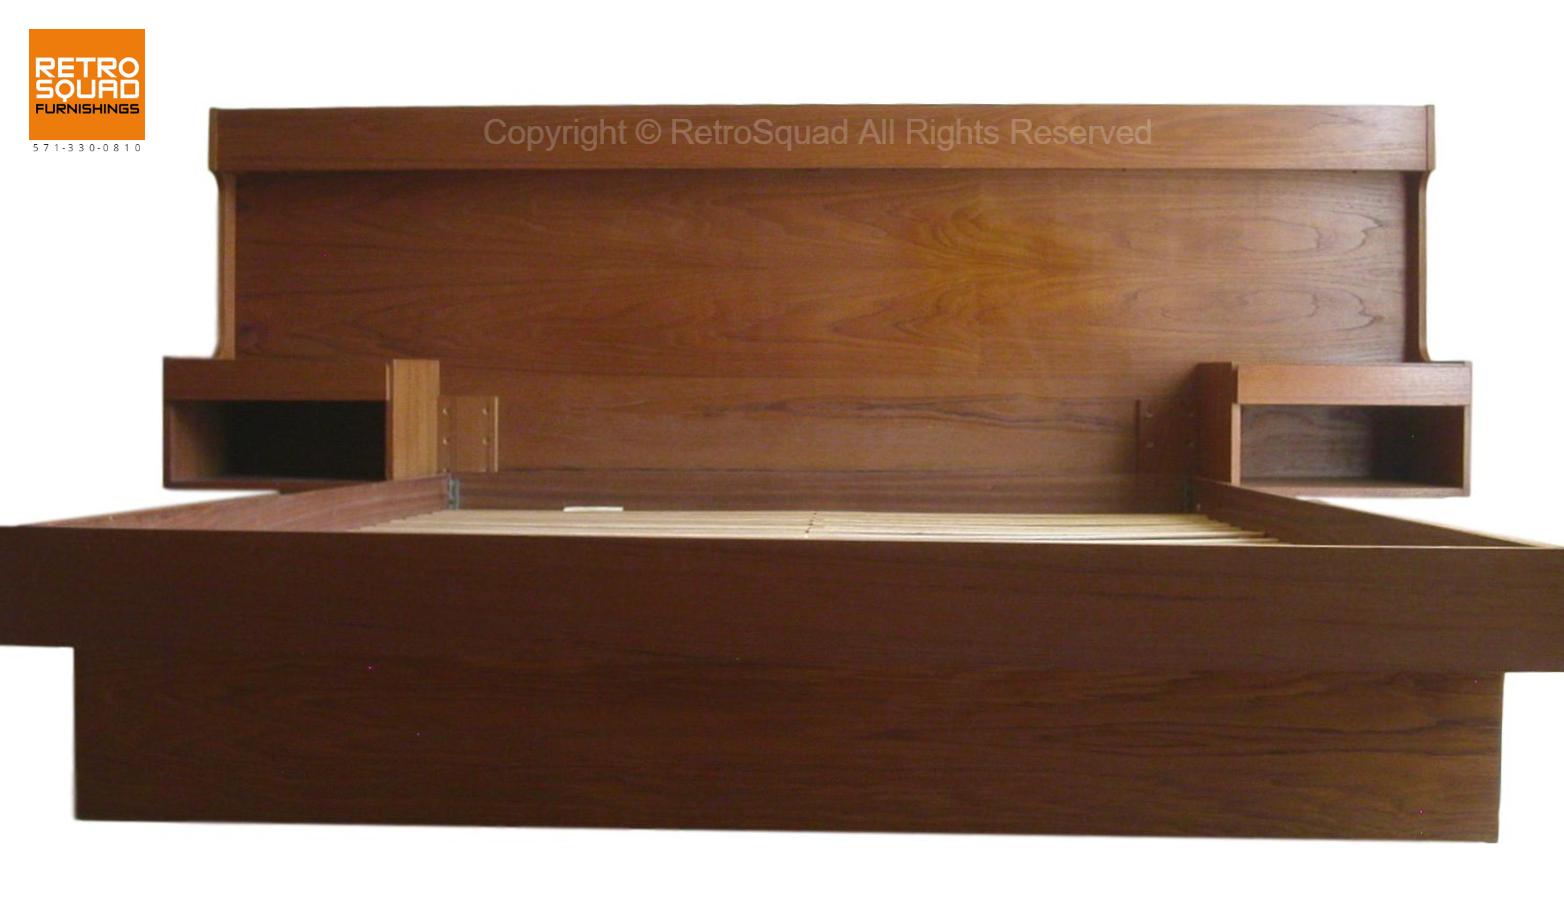 Danish-Modern-QUEEN-Size-Teak-Platform-Bed-With-Nightstands-Lighted-Headboard-from-Sannemanns-of-Denmark-05